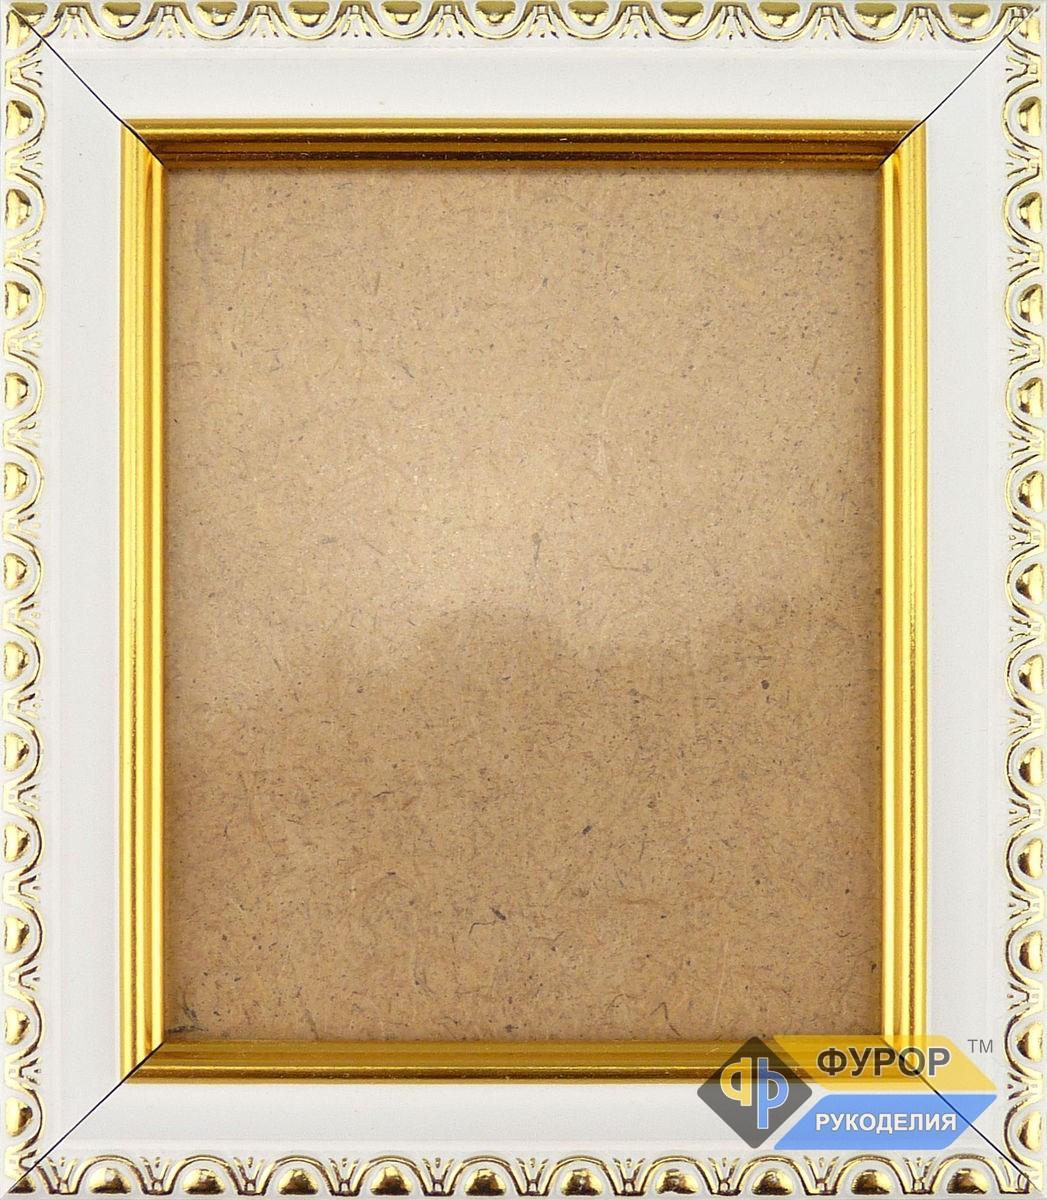 Рамка А6 (8х10 см) для вышитых картин и икон ТМ Фурор Рукоделия (ФР-А6-1099)